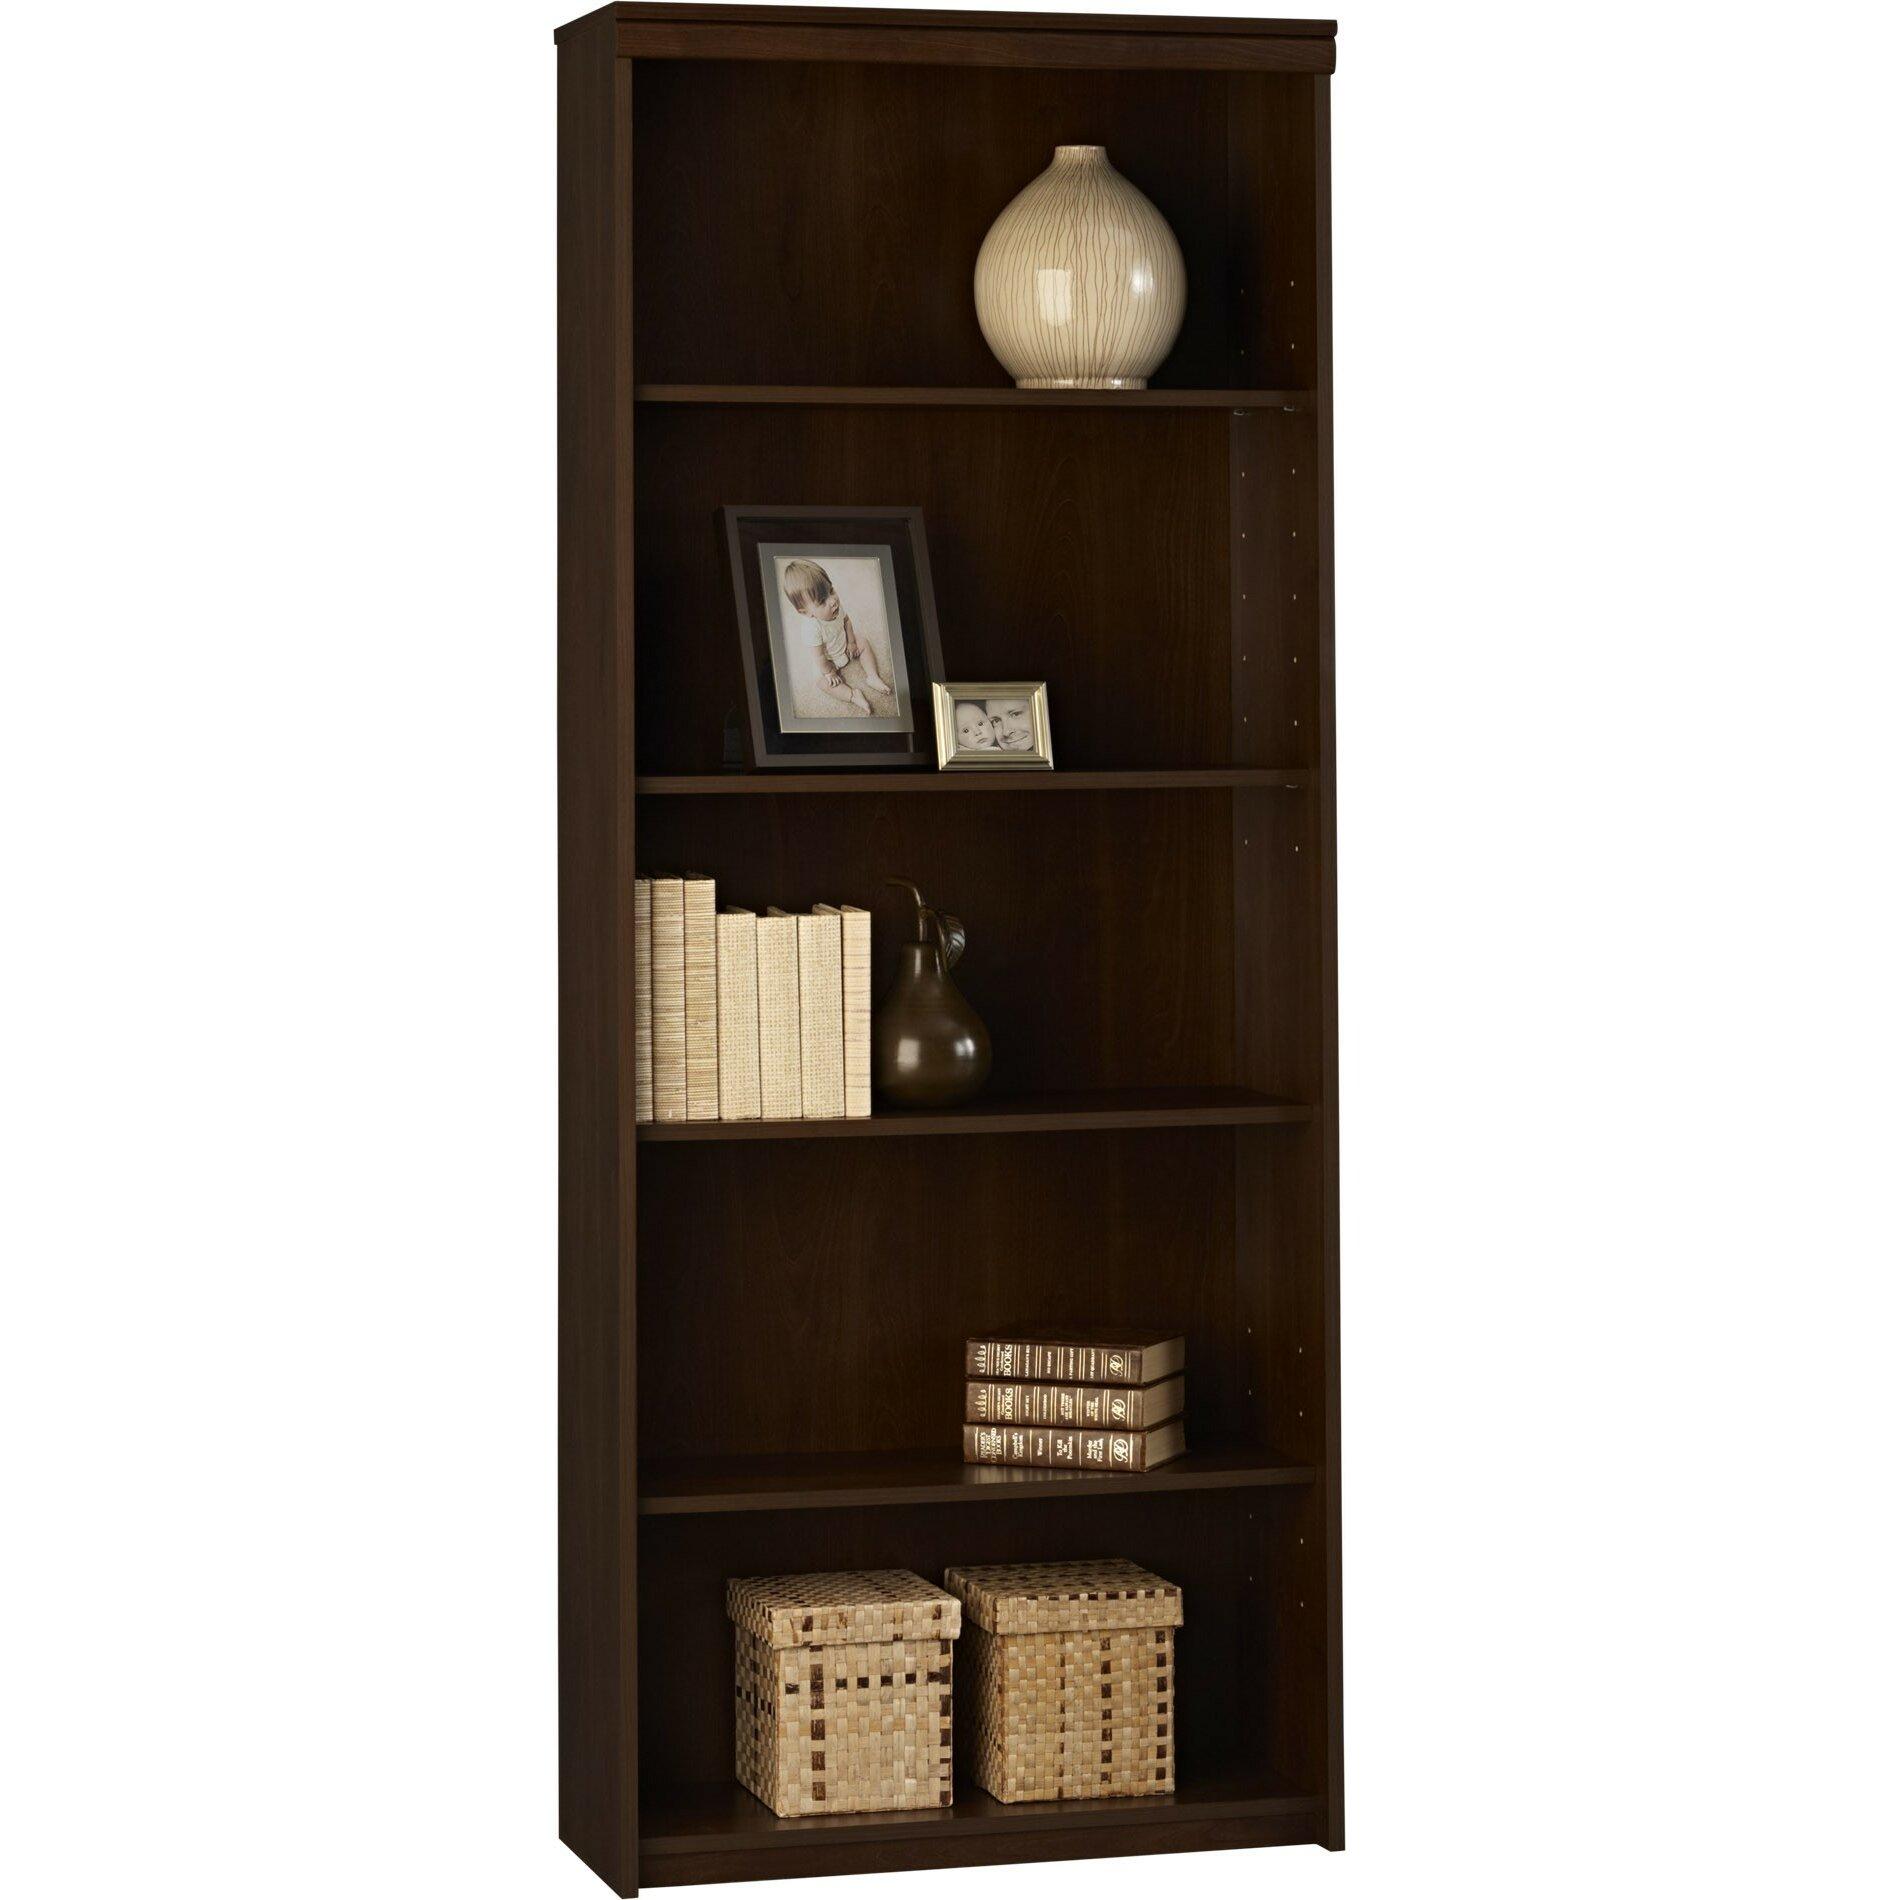 Co colour coordinated bookshelf - Ameriwood Industries 72 Quot Standard Bookcase